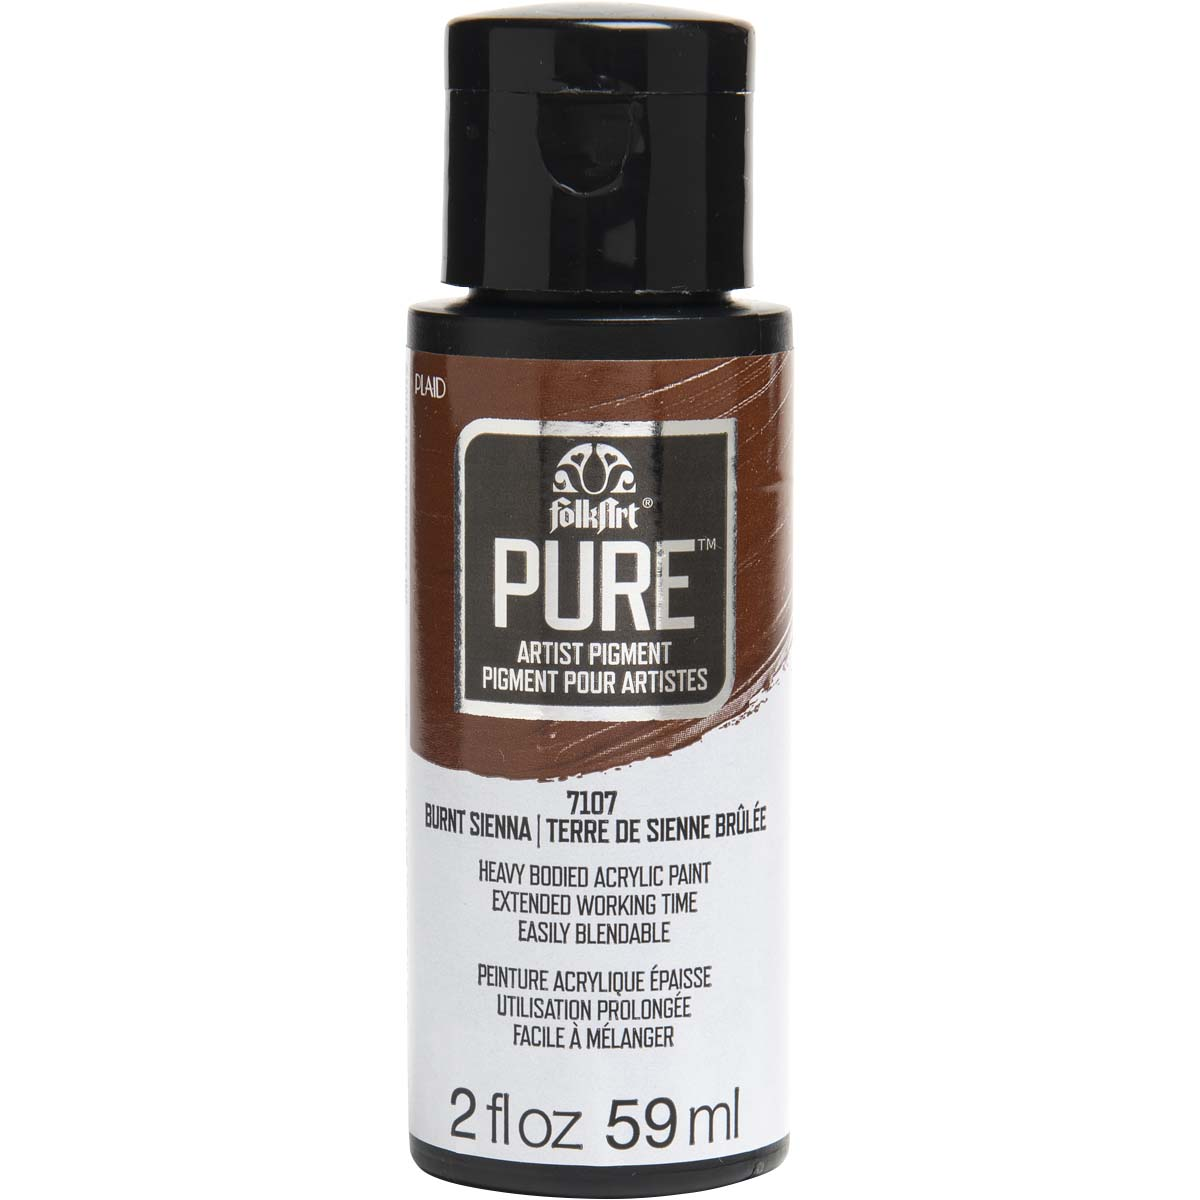 FolkArt ® Pure™ Artist Pigment - Burnt Sienna, 2 oz. - 7107